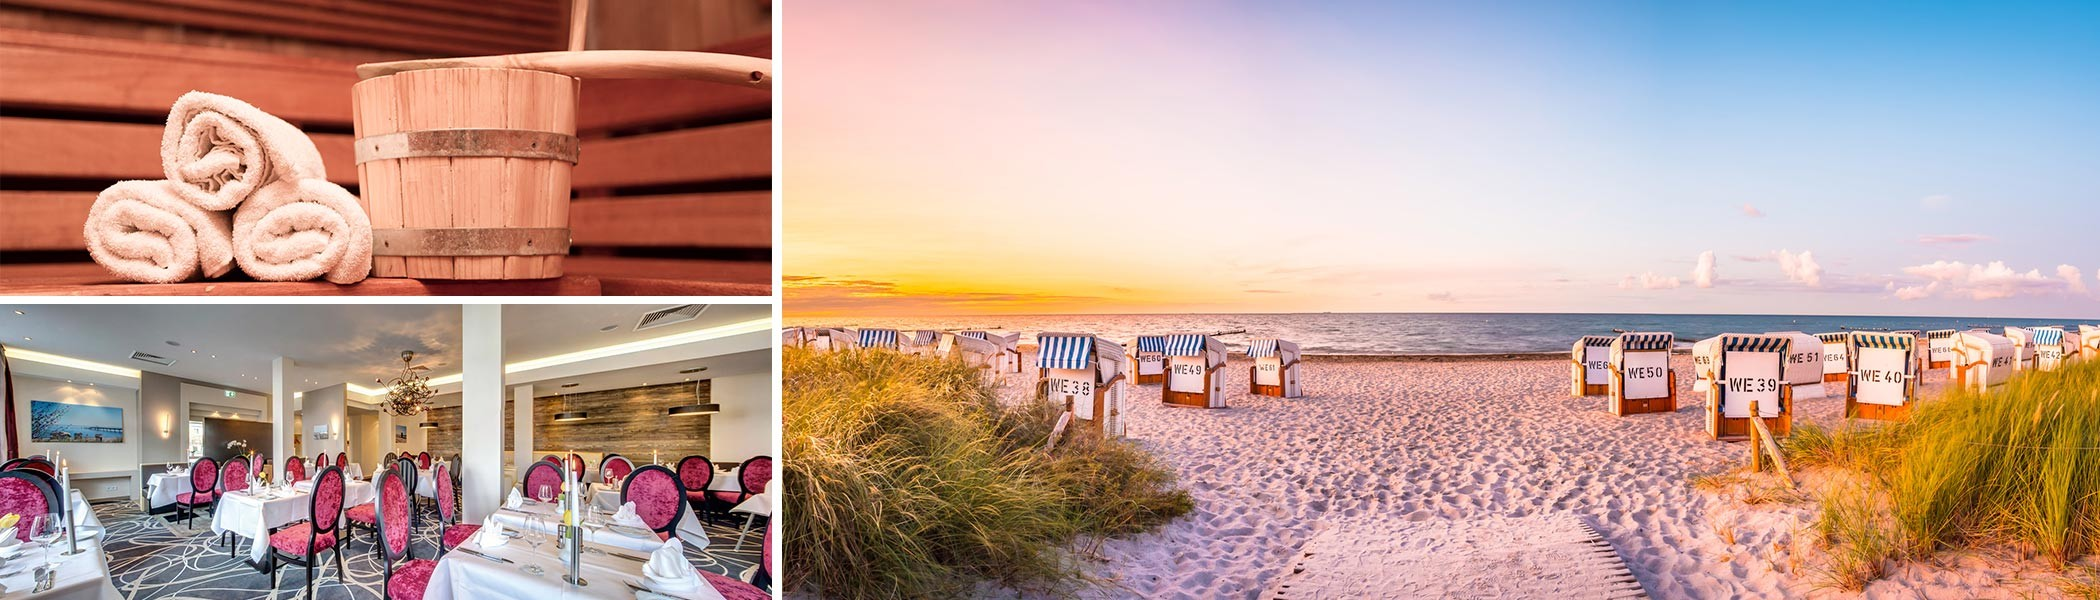 Ostsee-Hotels - VacancyCard-Voucher